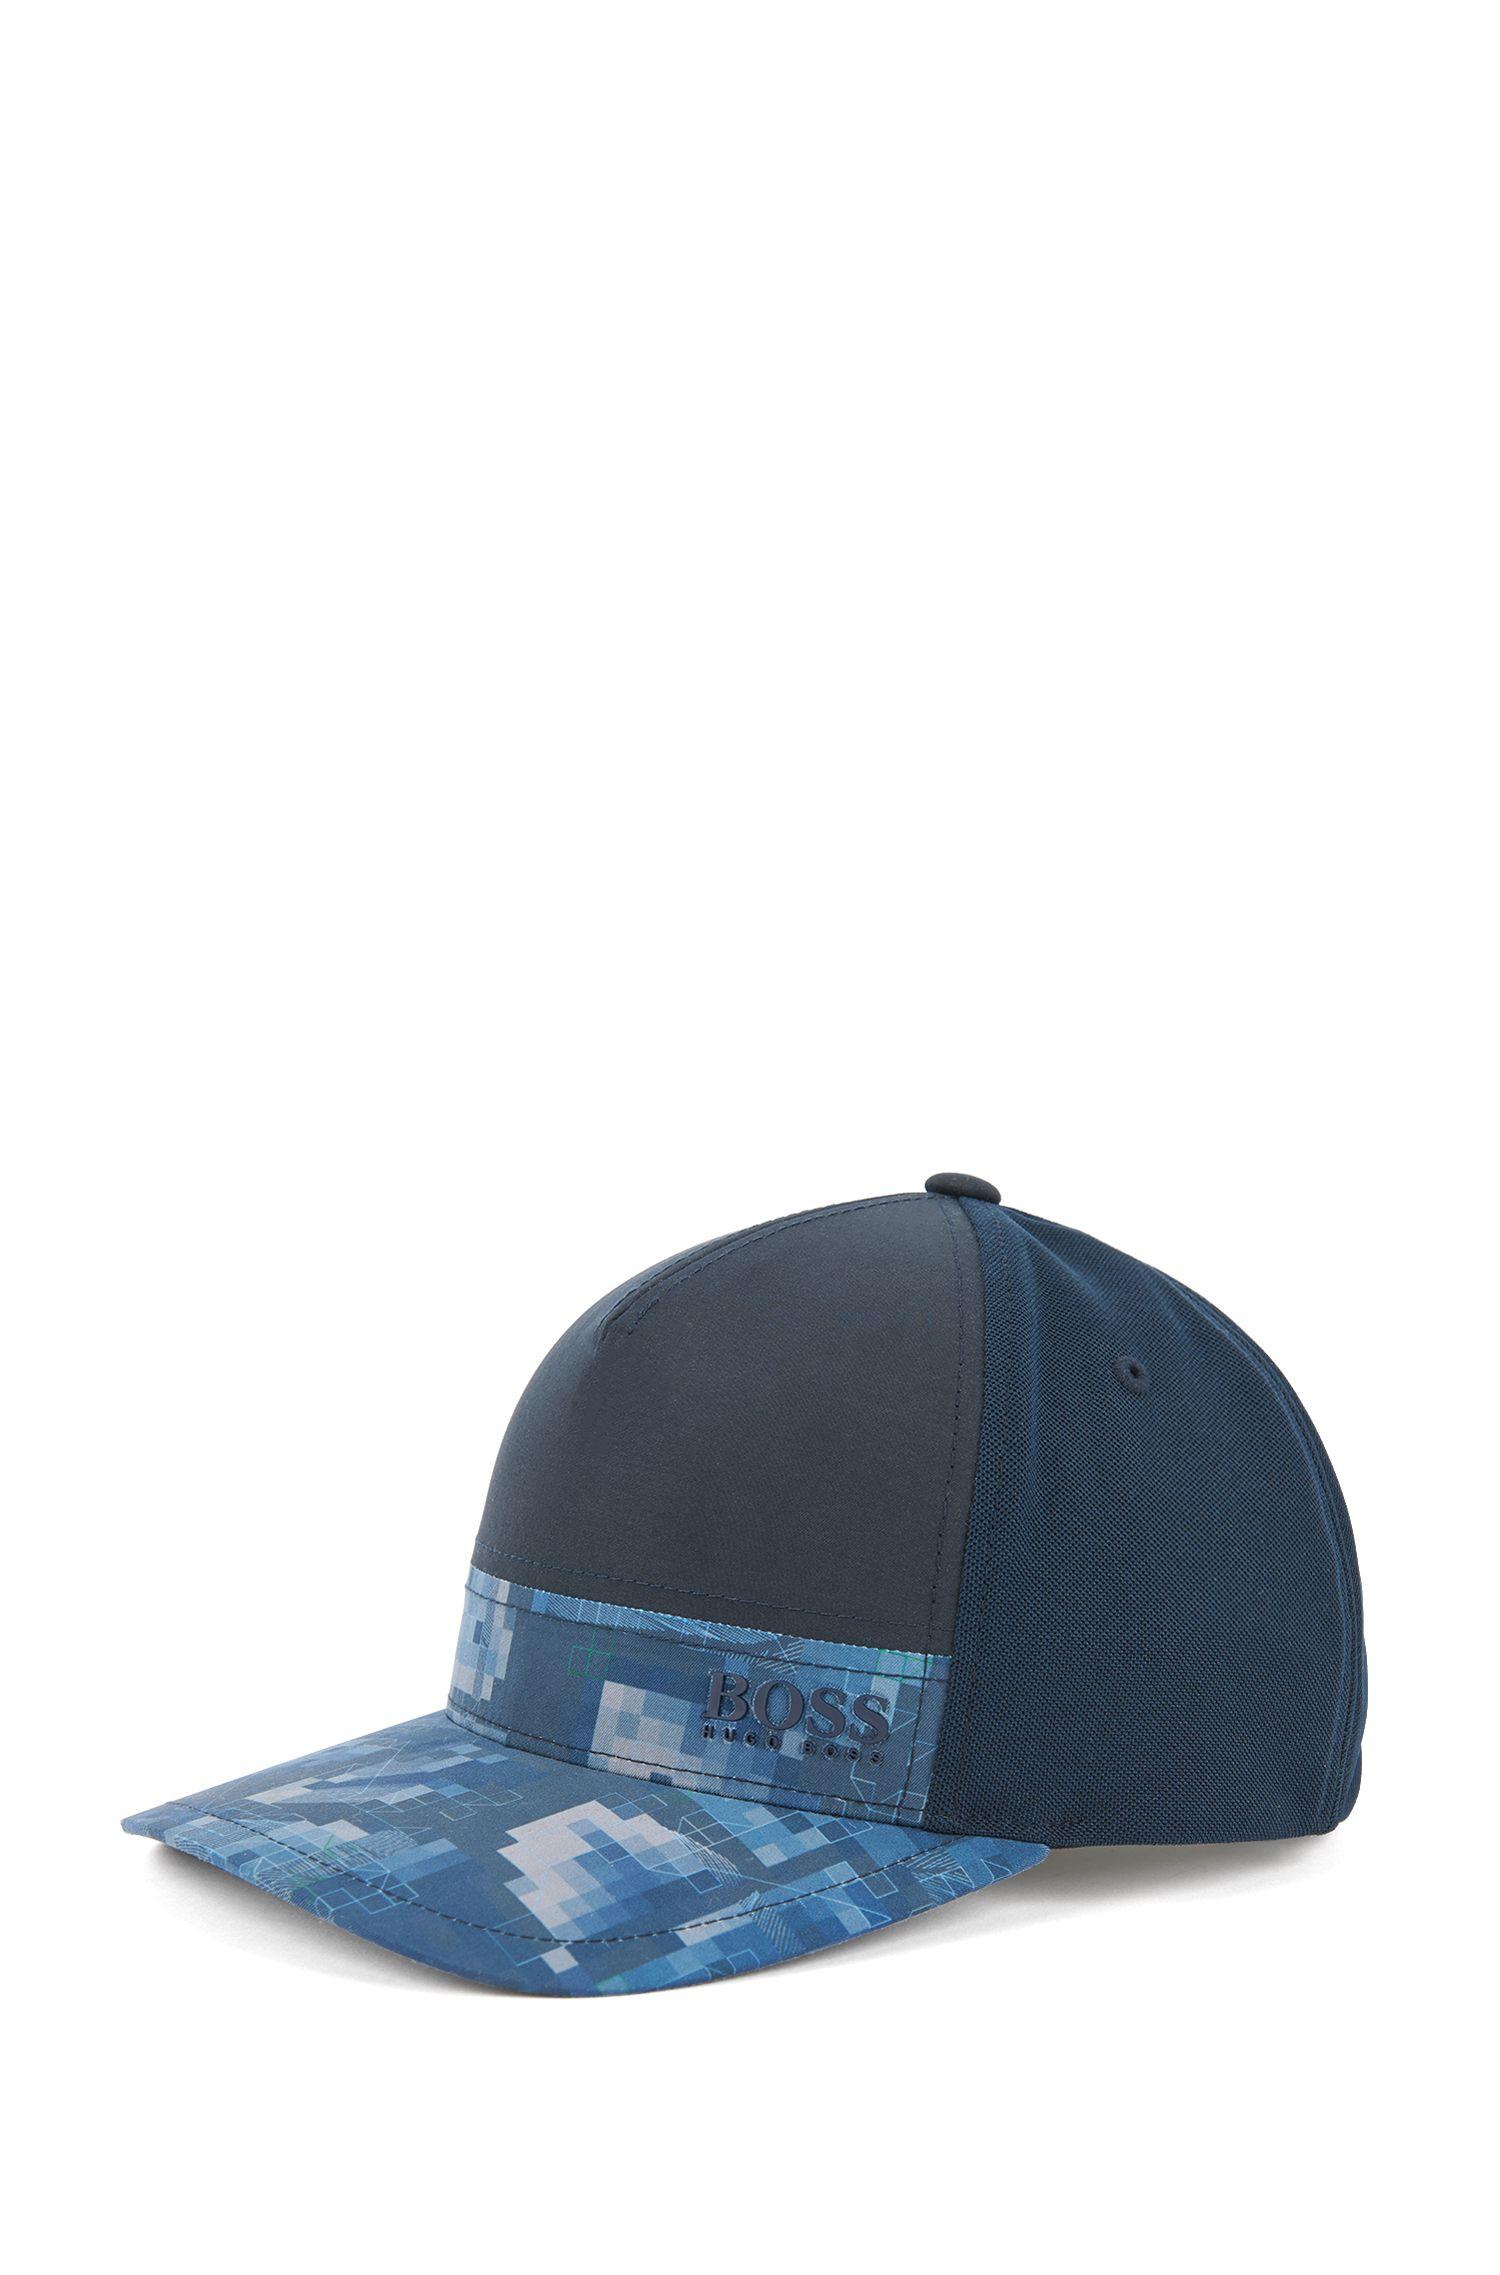 Bedruckte Baseball Cap im Colour-Block-Design